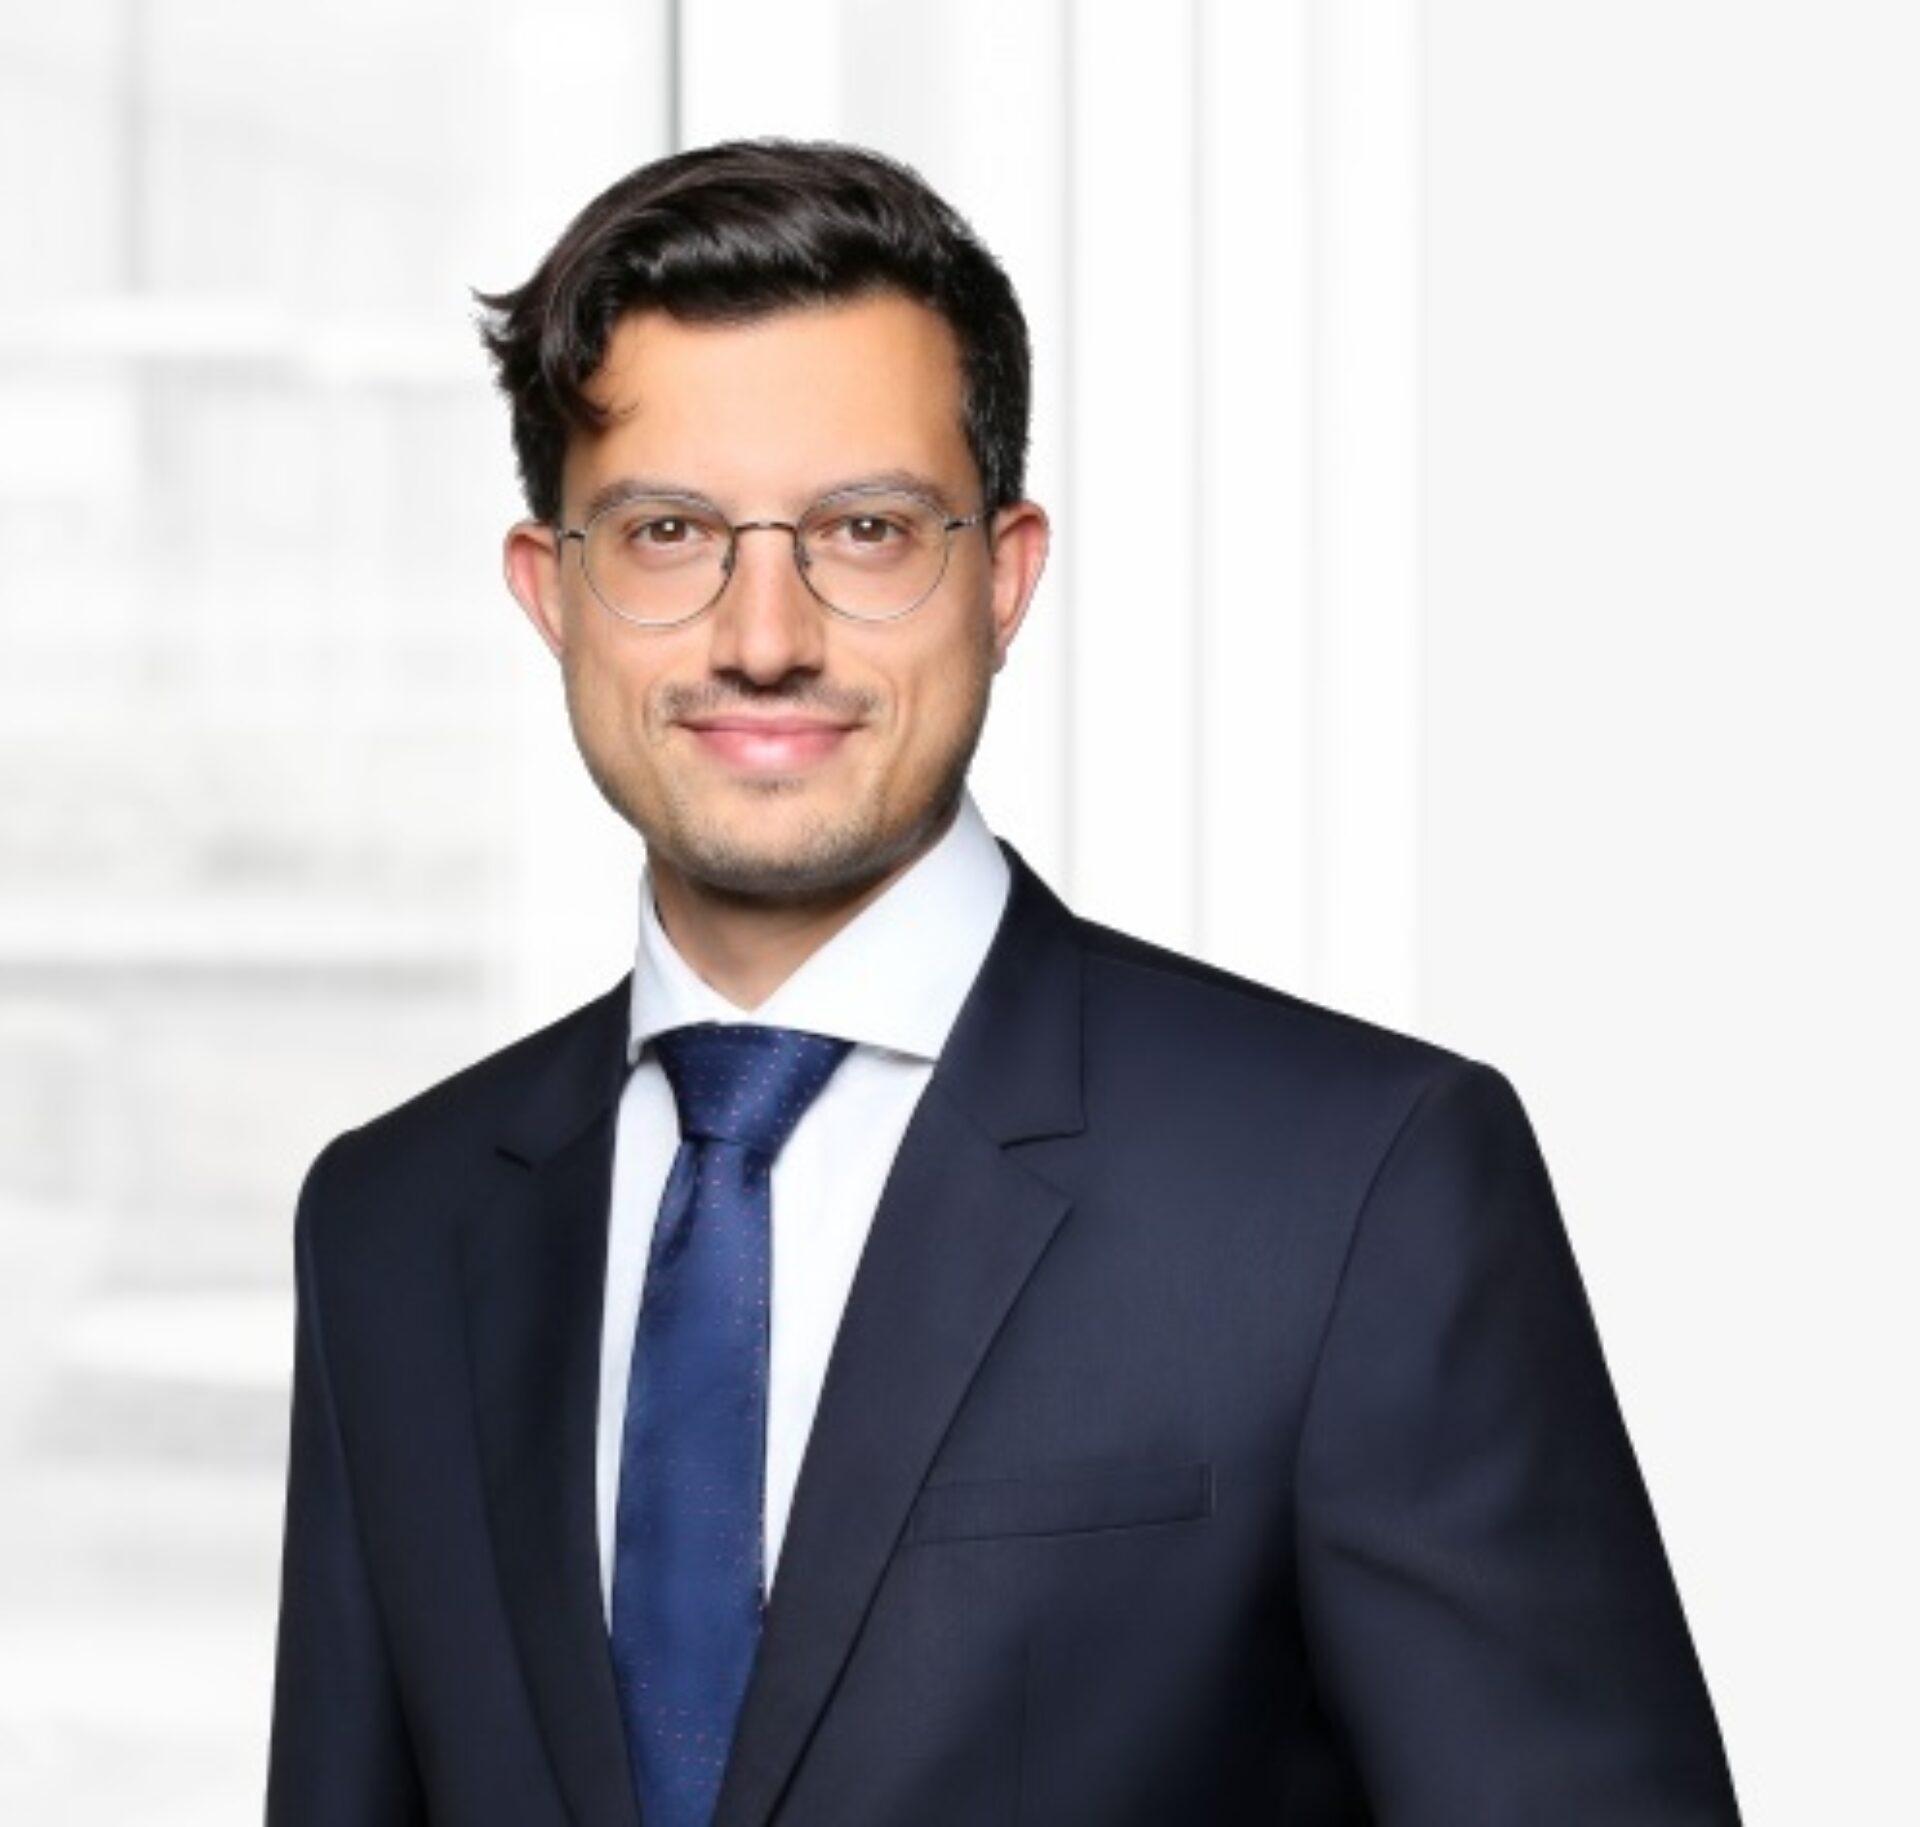 Photo of Marc da Fonseca-Wollheim